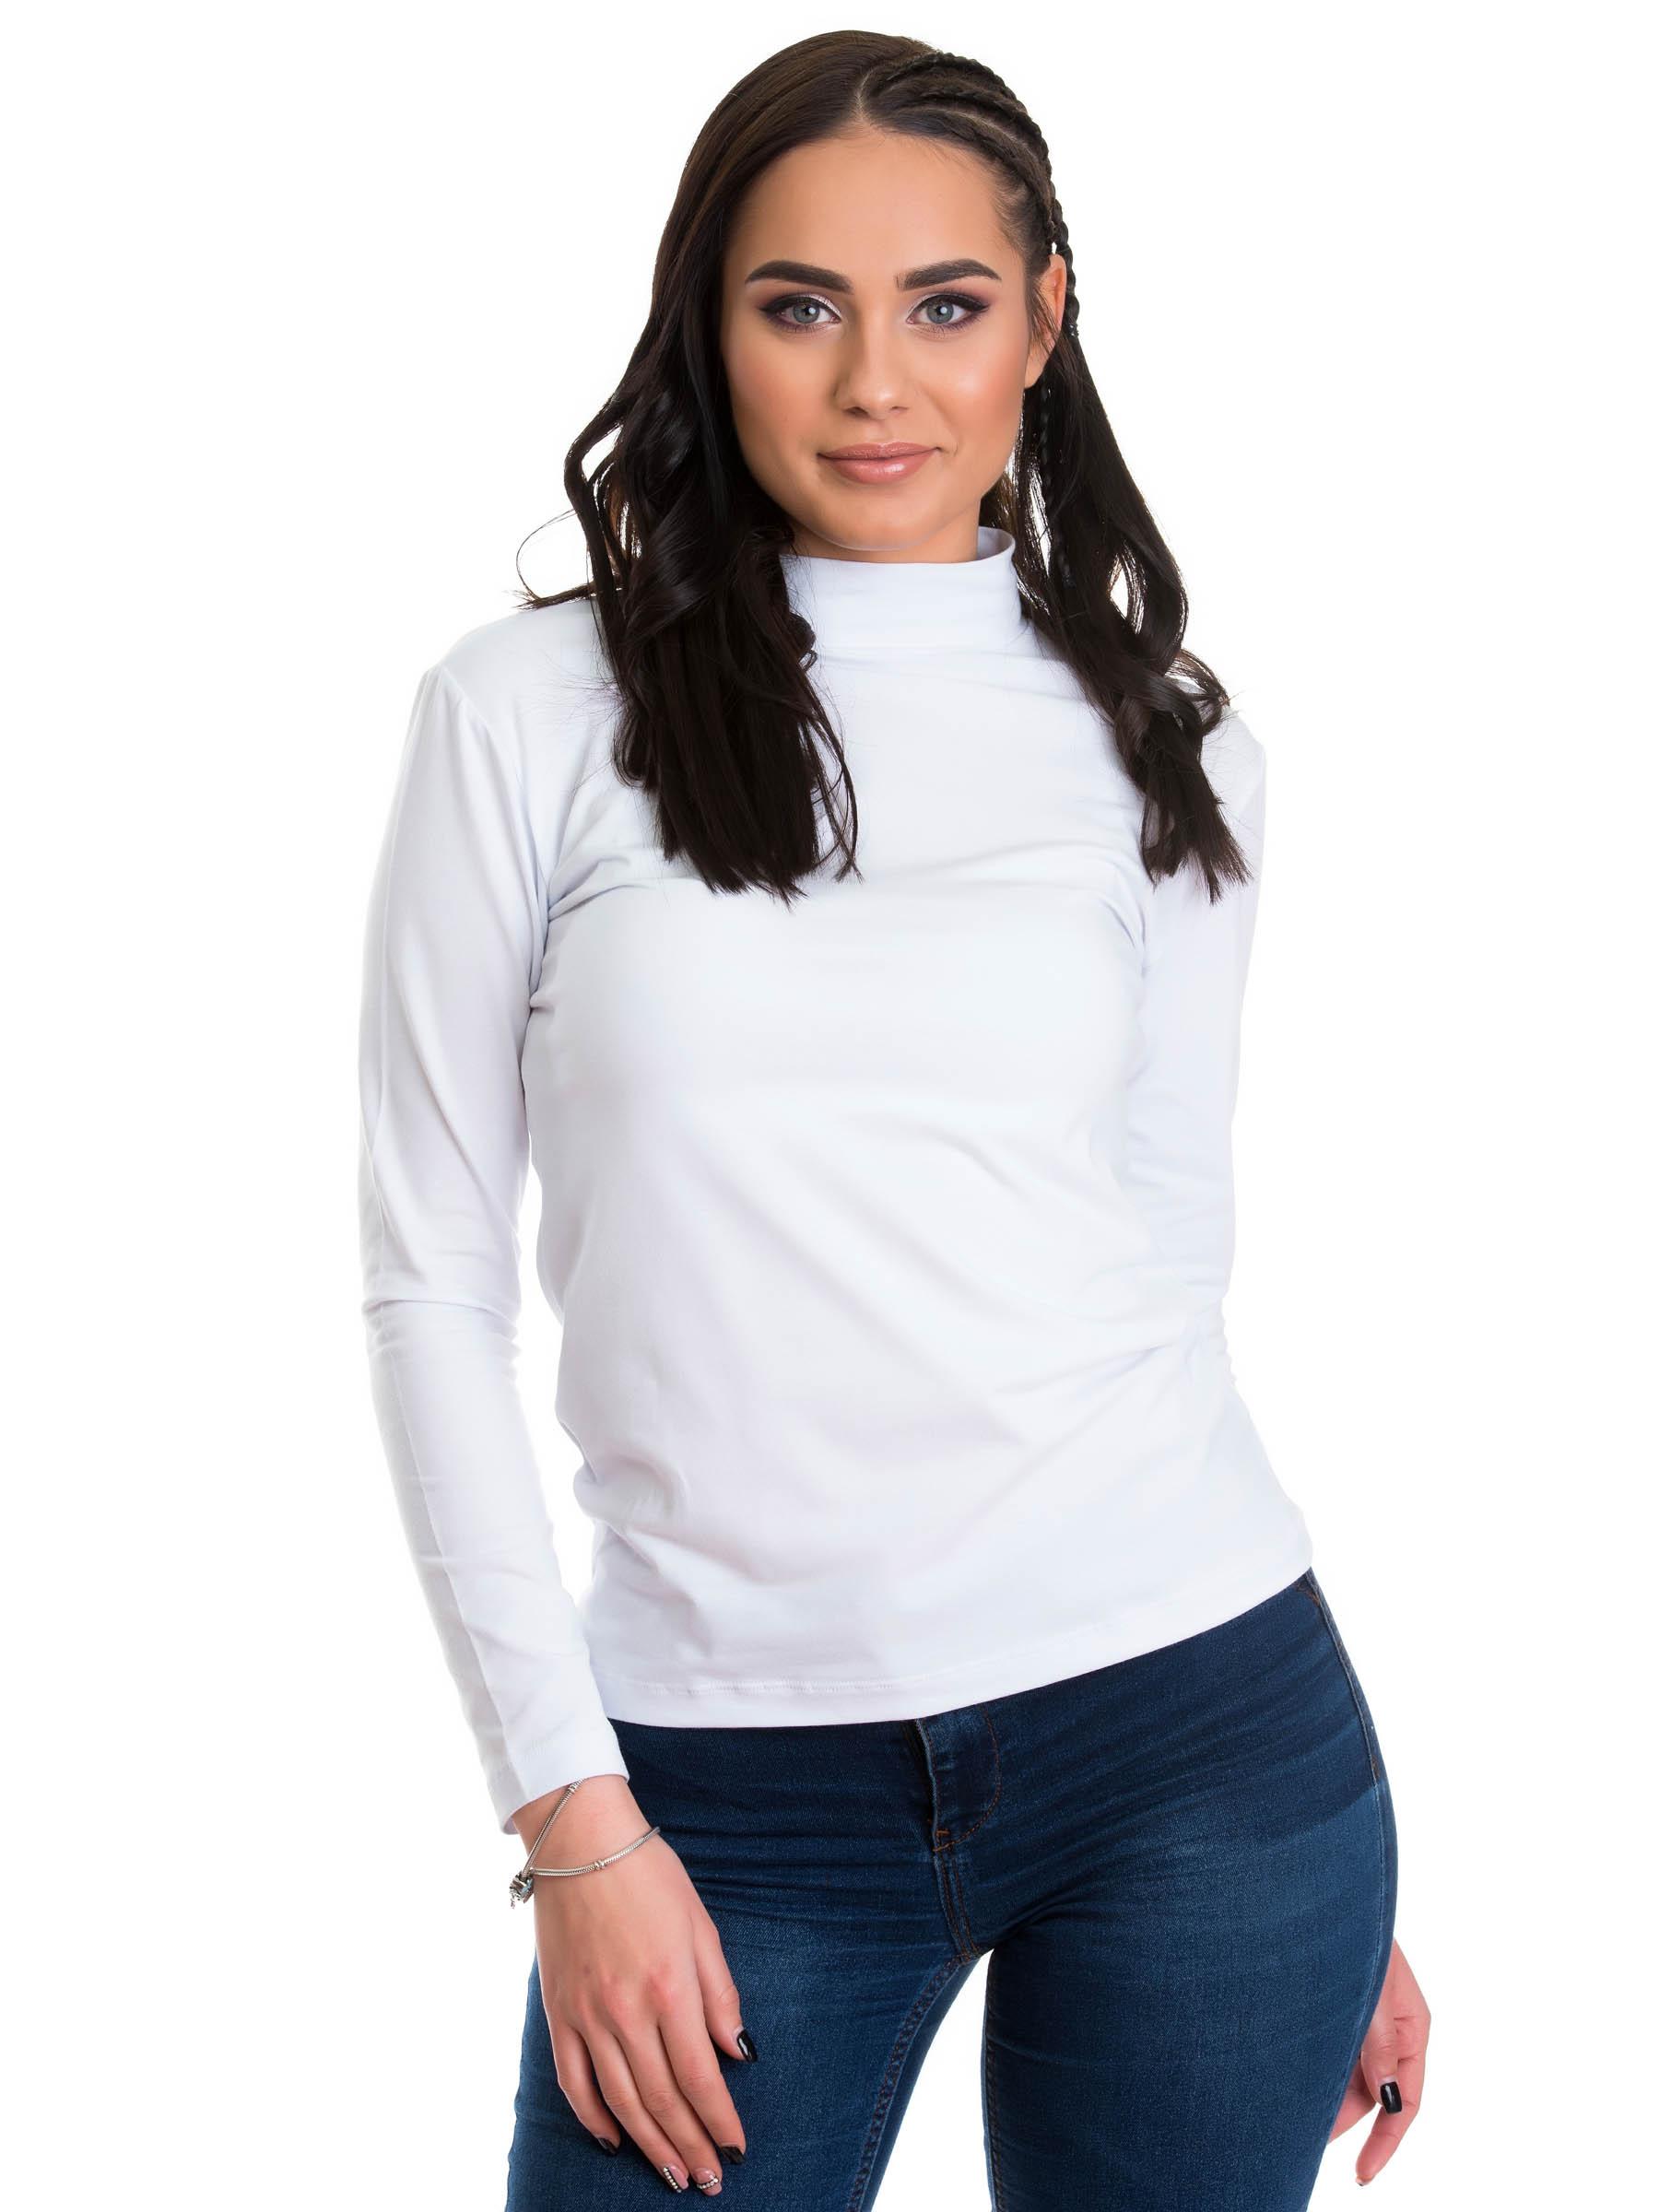 Evoni Langarm-Shirt mit Halbkragen